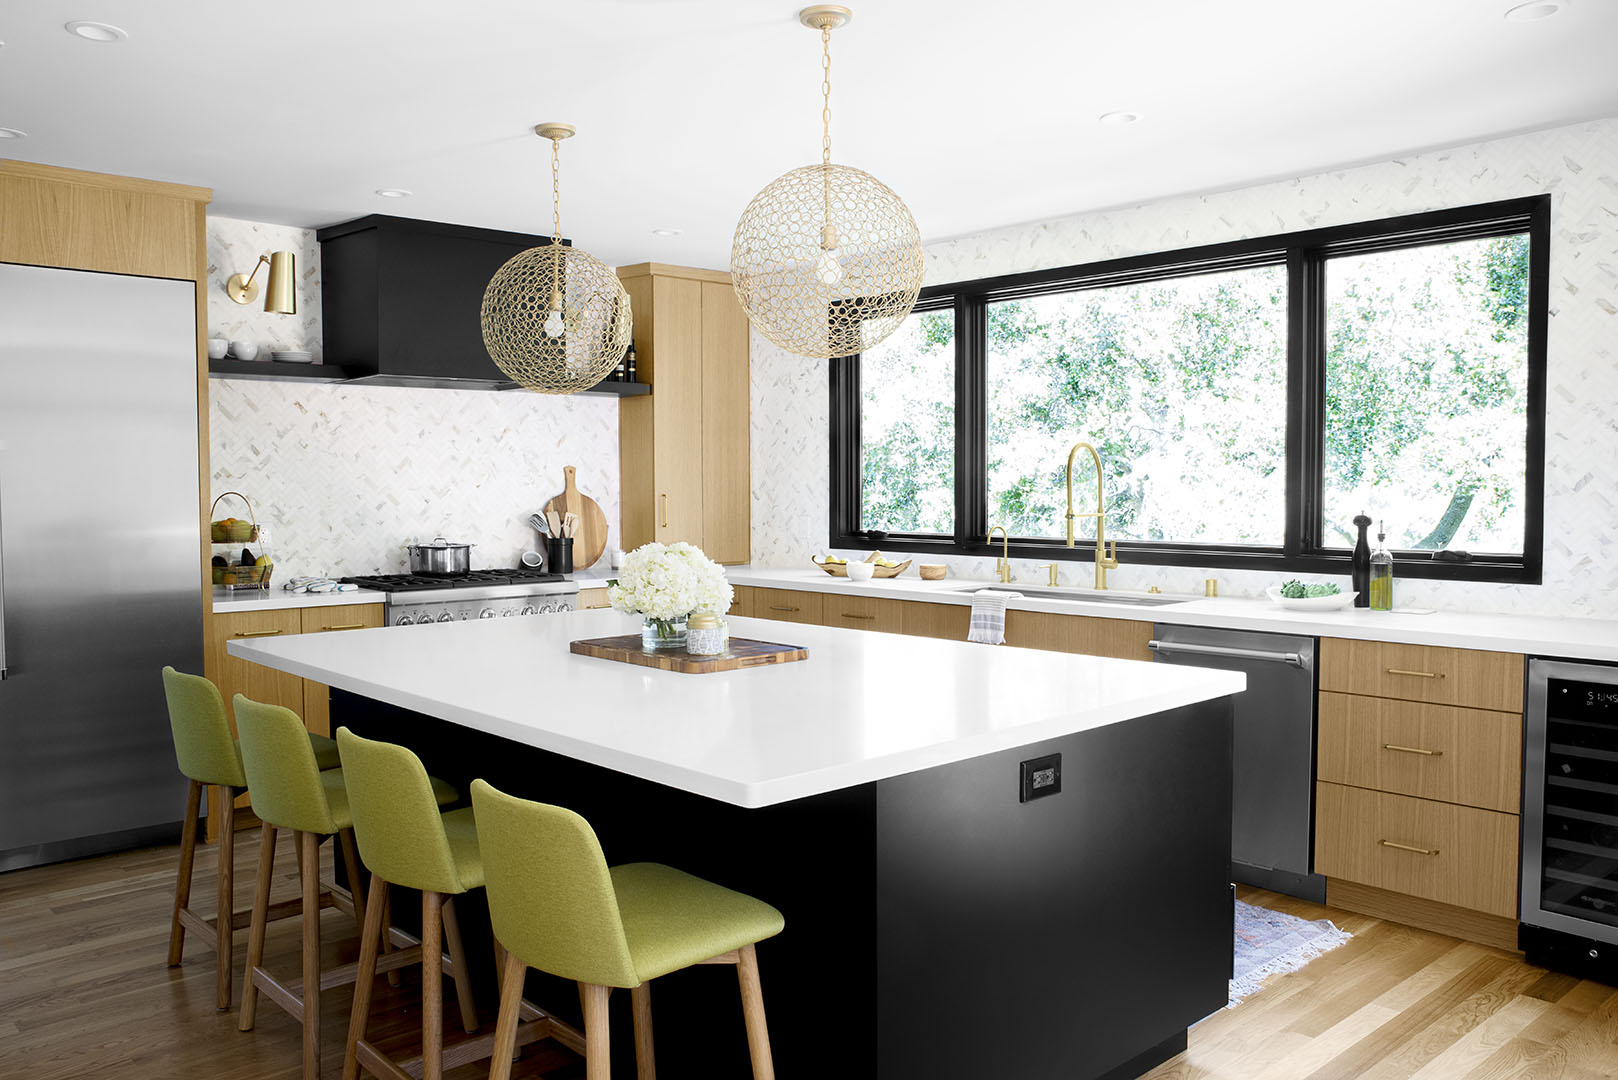 Kitchen remodel Oakland, CA